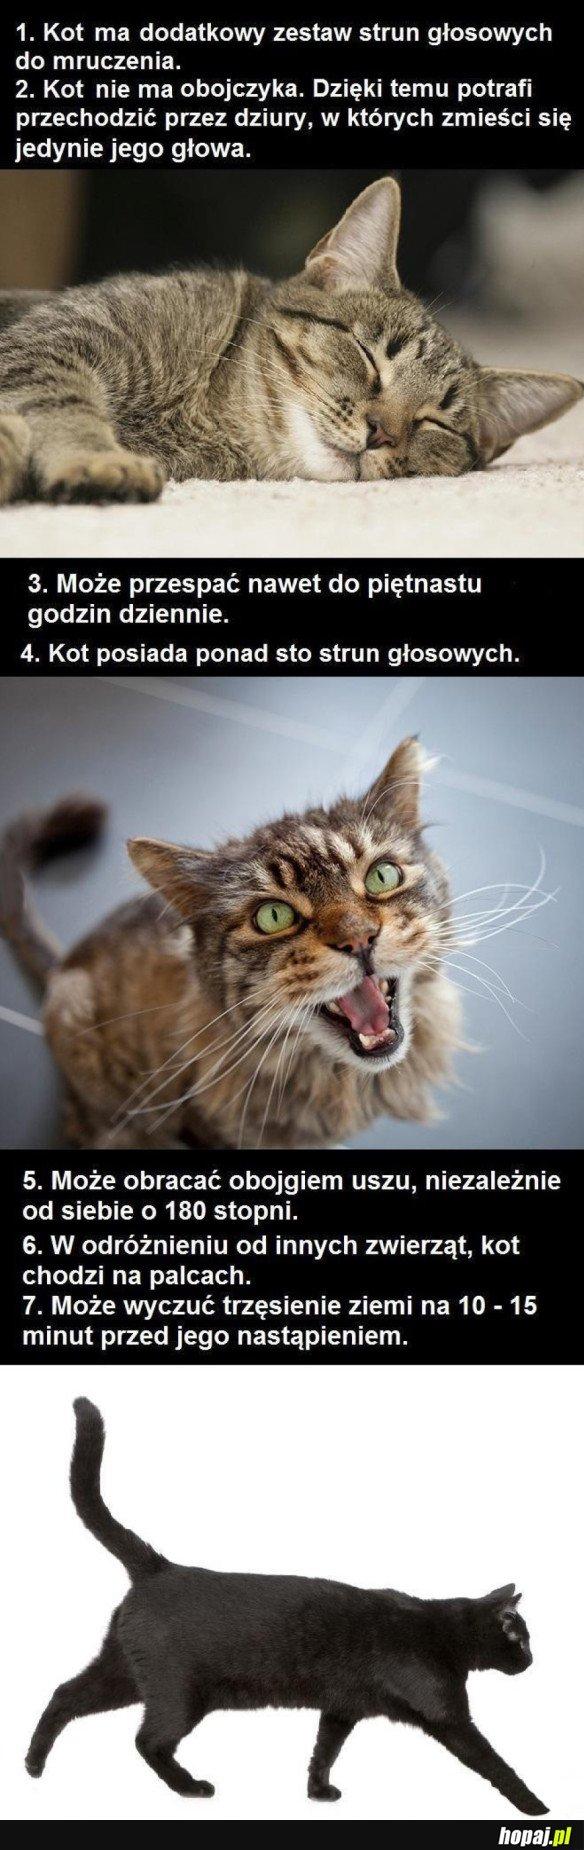 Kilka ciekawostek o kotach